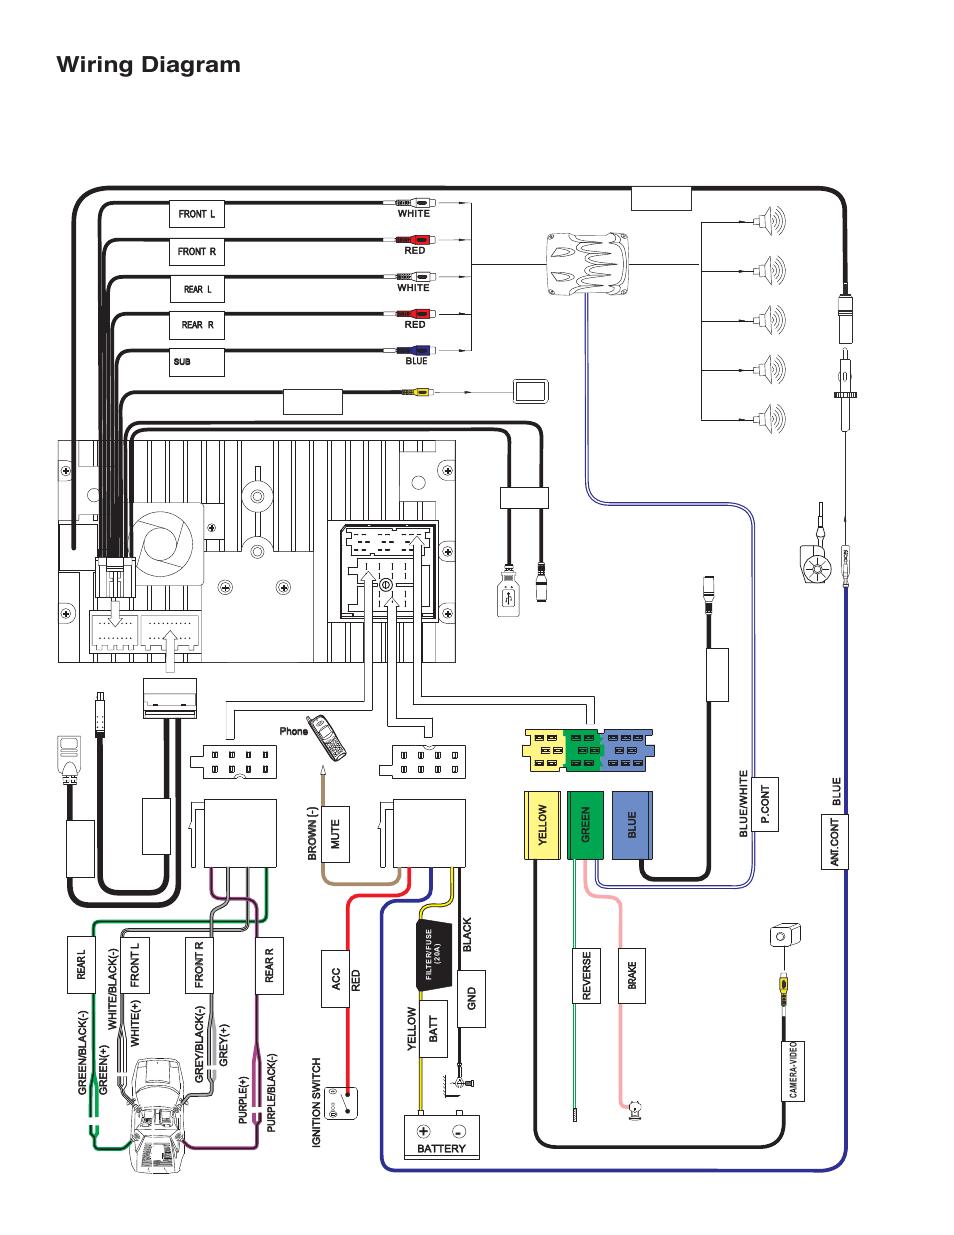 jensen vm9224 page4?resize\\\\\\\=665%2C861 viper 5900 wiring diagram car alarm installation wiring diagrams viper 5002 wiring diagram at readyjetset.co